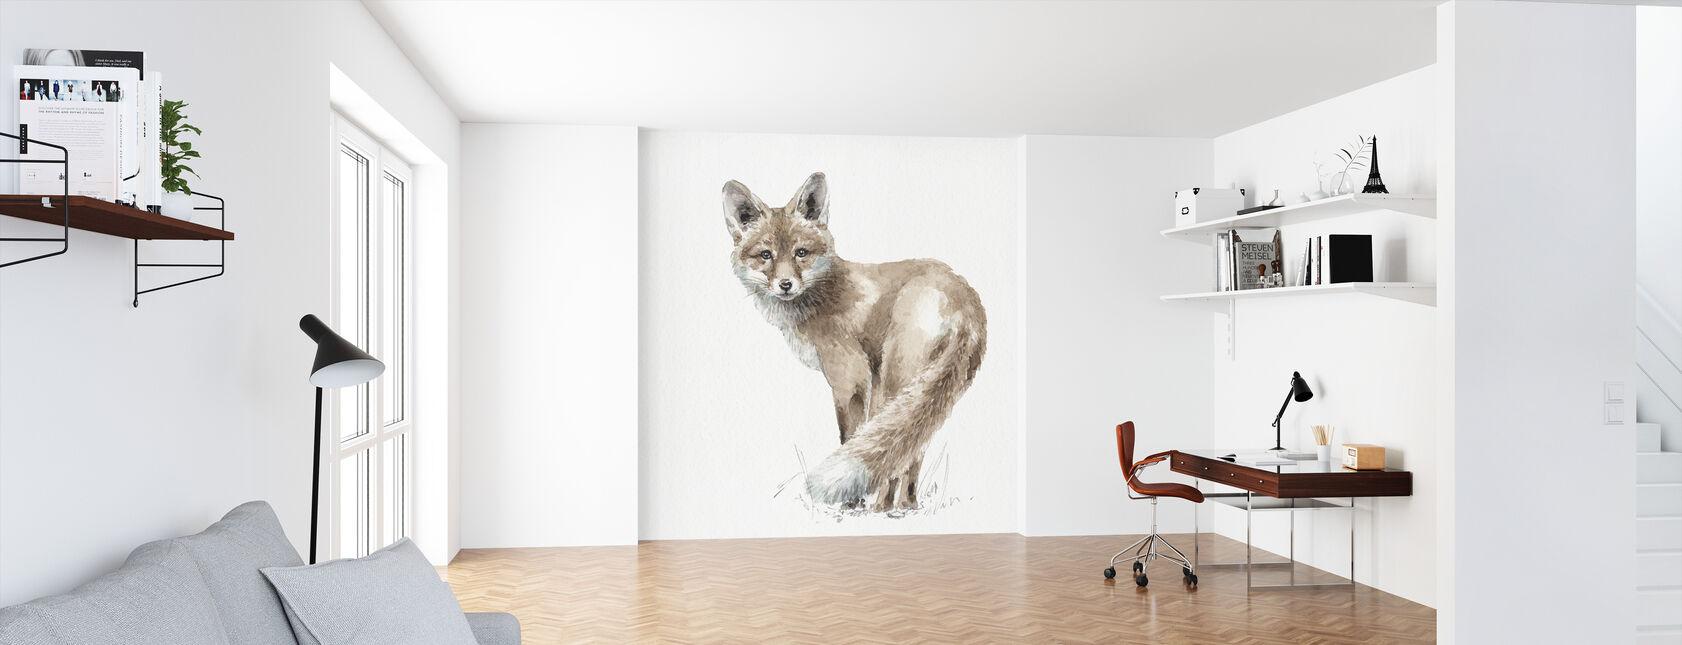 Forest Friends XI - Wallpaper - Office